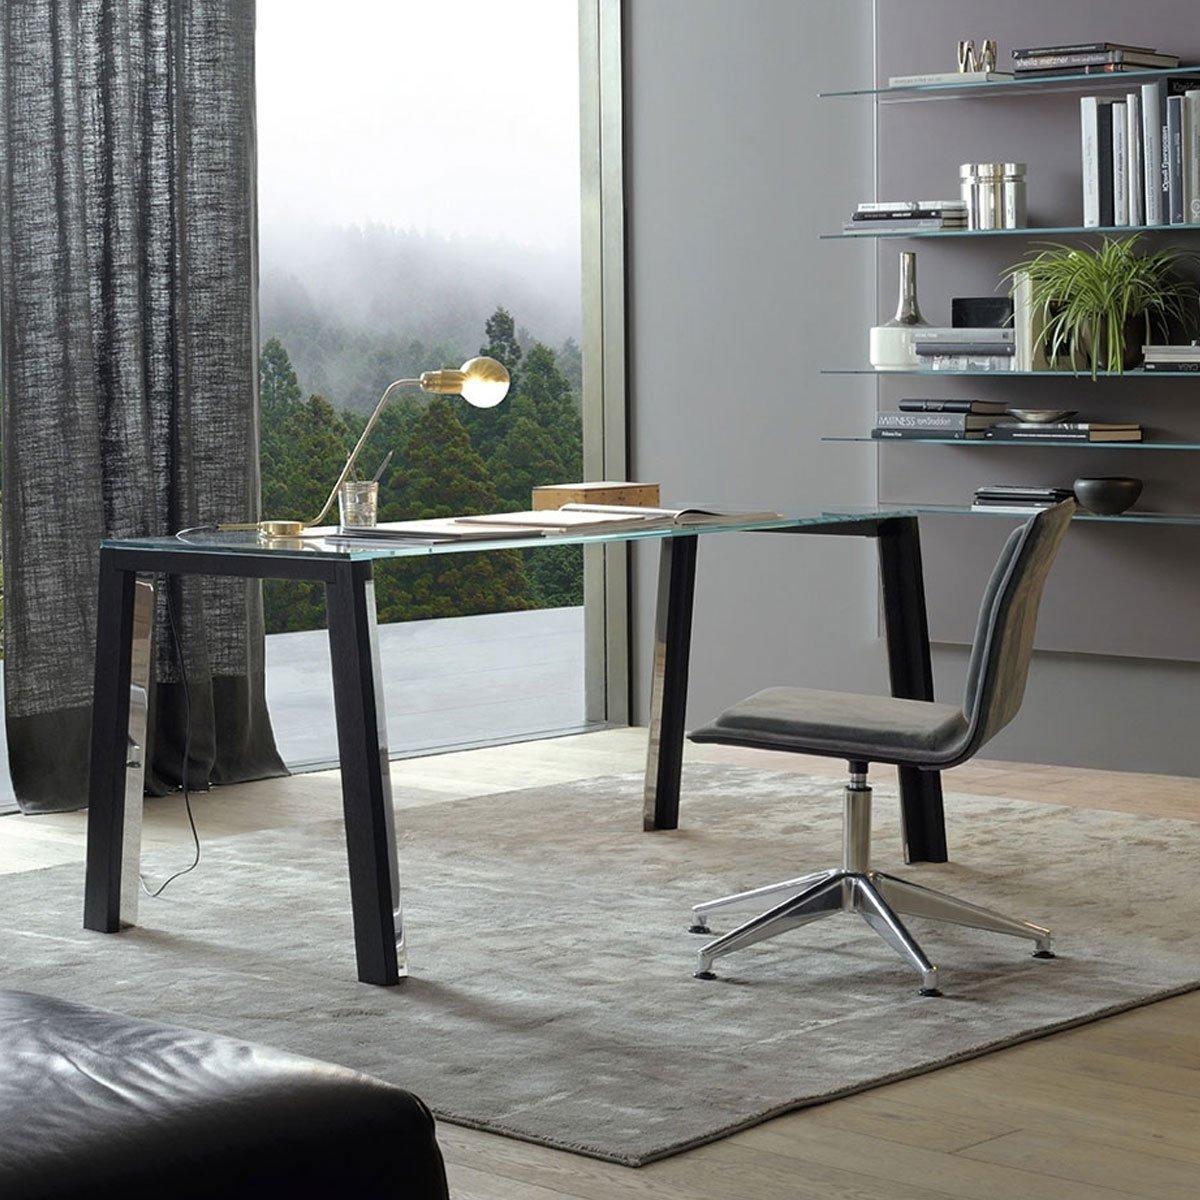 WGS Glass And Wood Table By Gallotti U0026 Radice